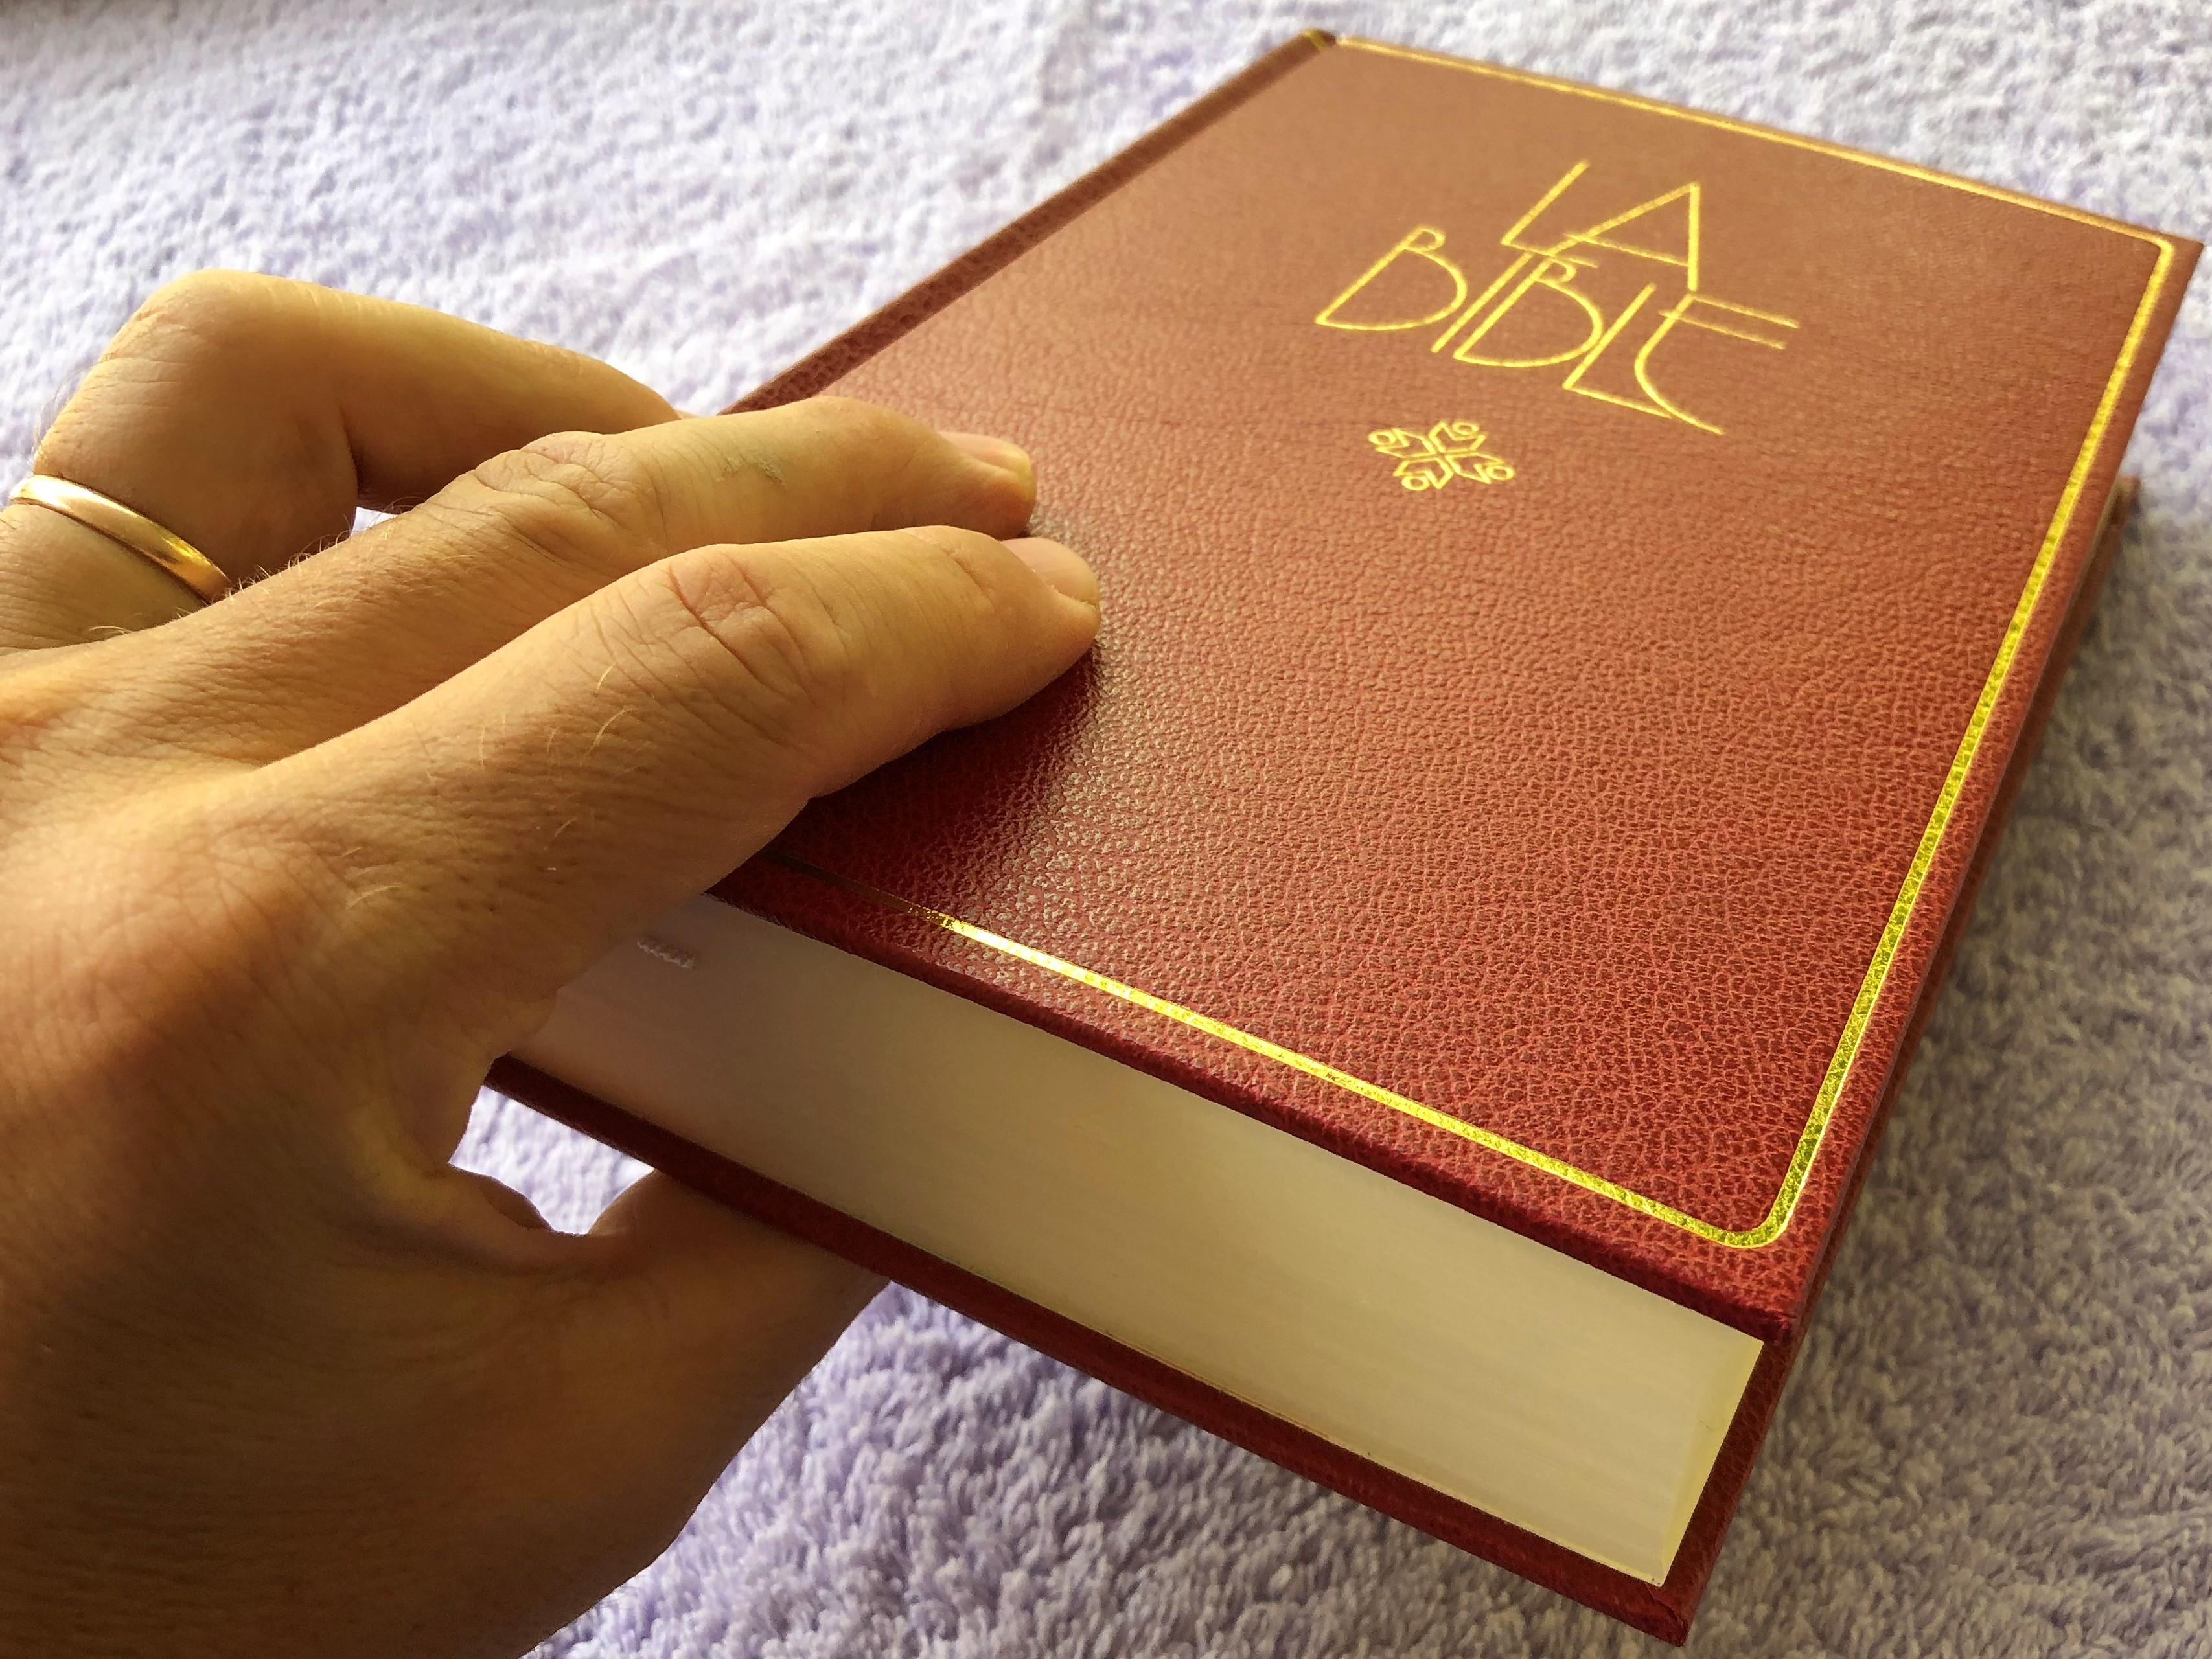 french-bible-1994-print-fch063-20-.jpg